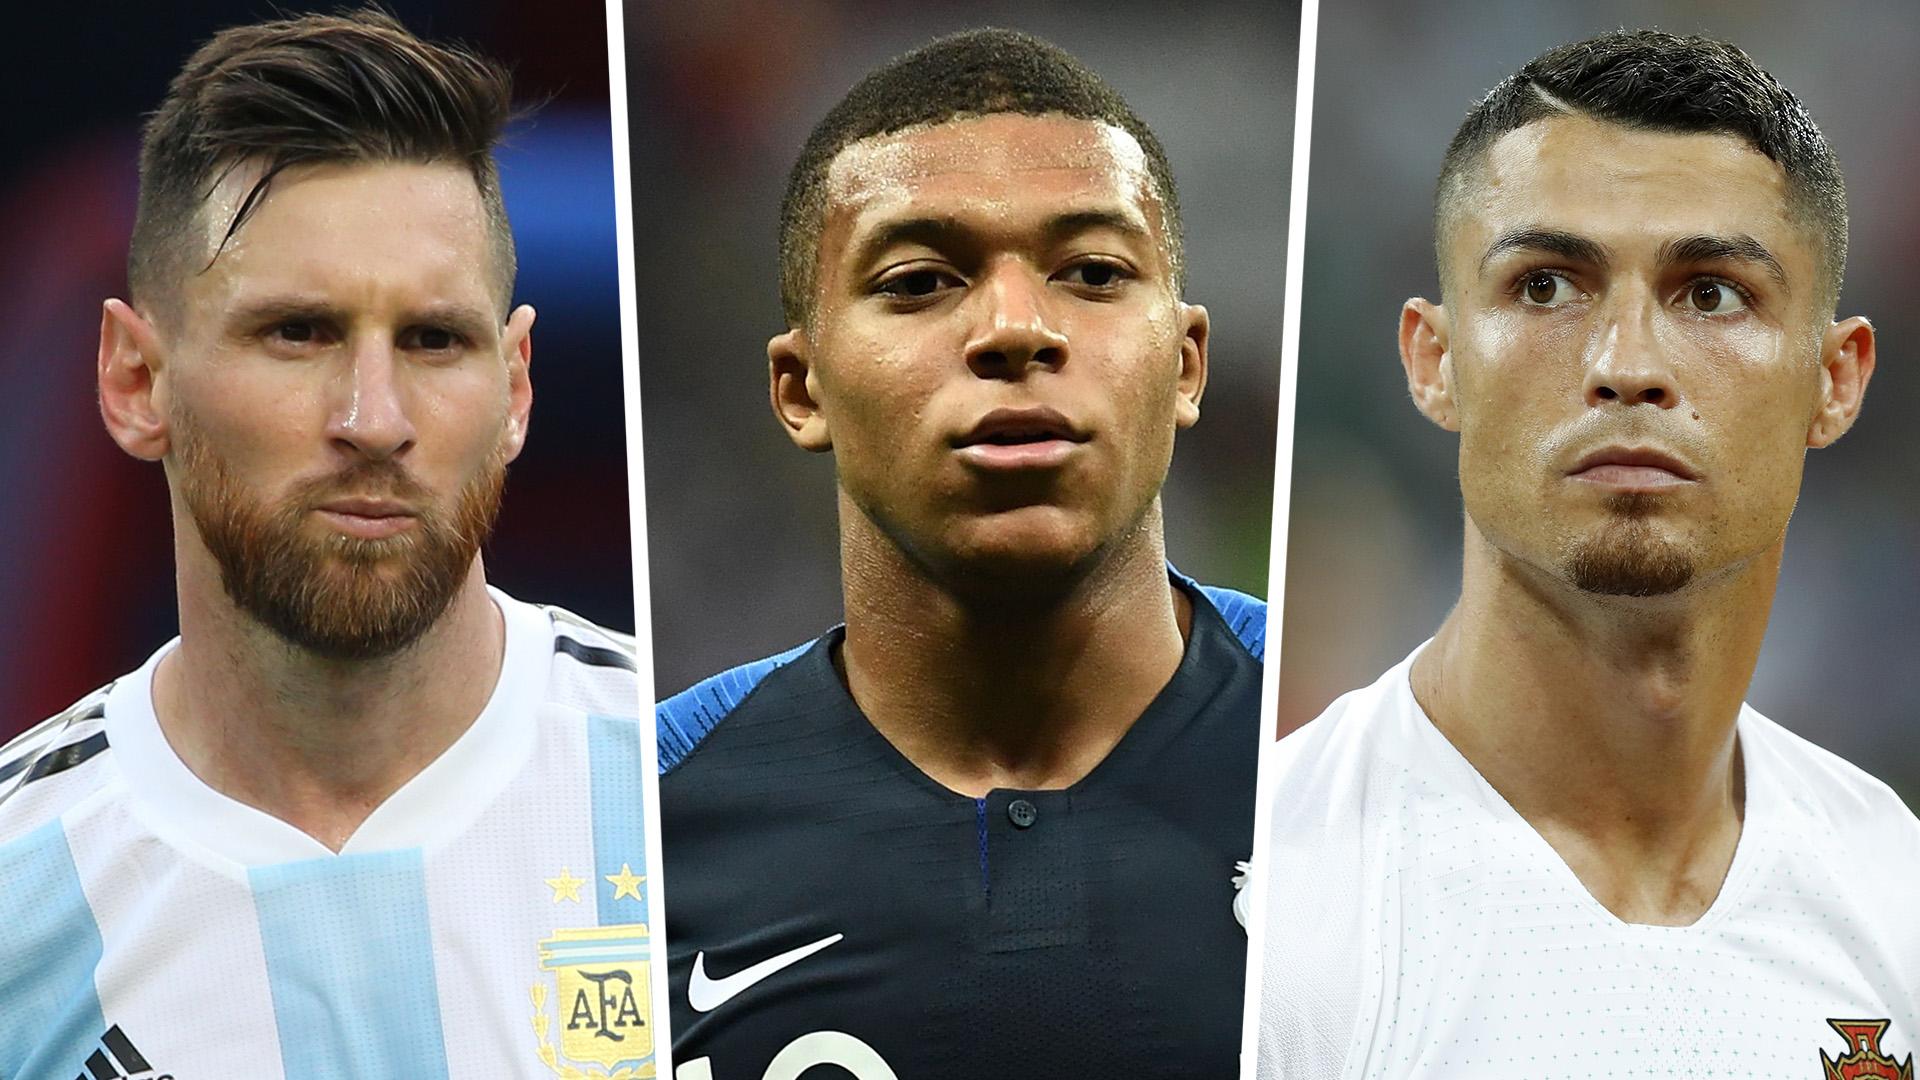 Messi-mbappe-ronaldo_ycqc9hh9tbsh1078pmaze9m3m